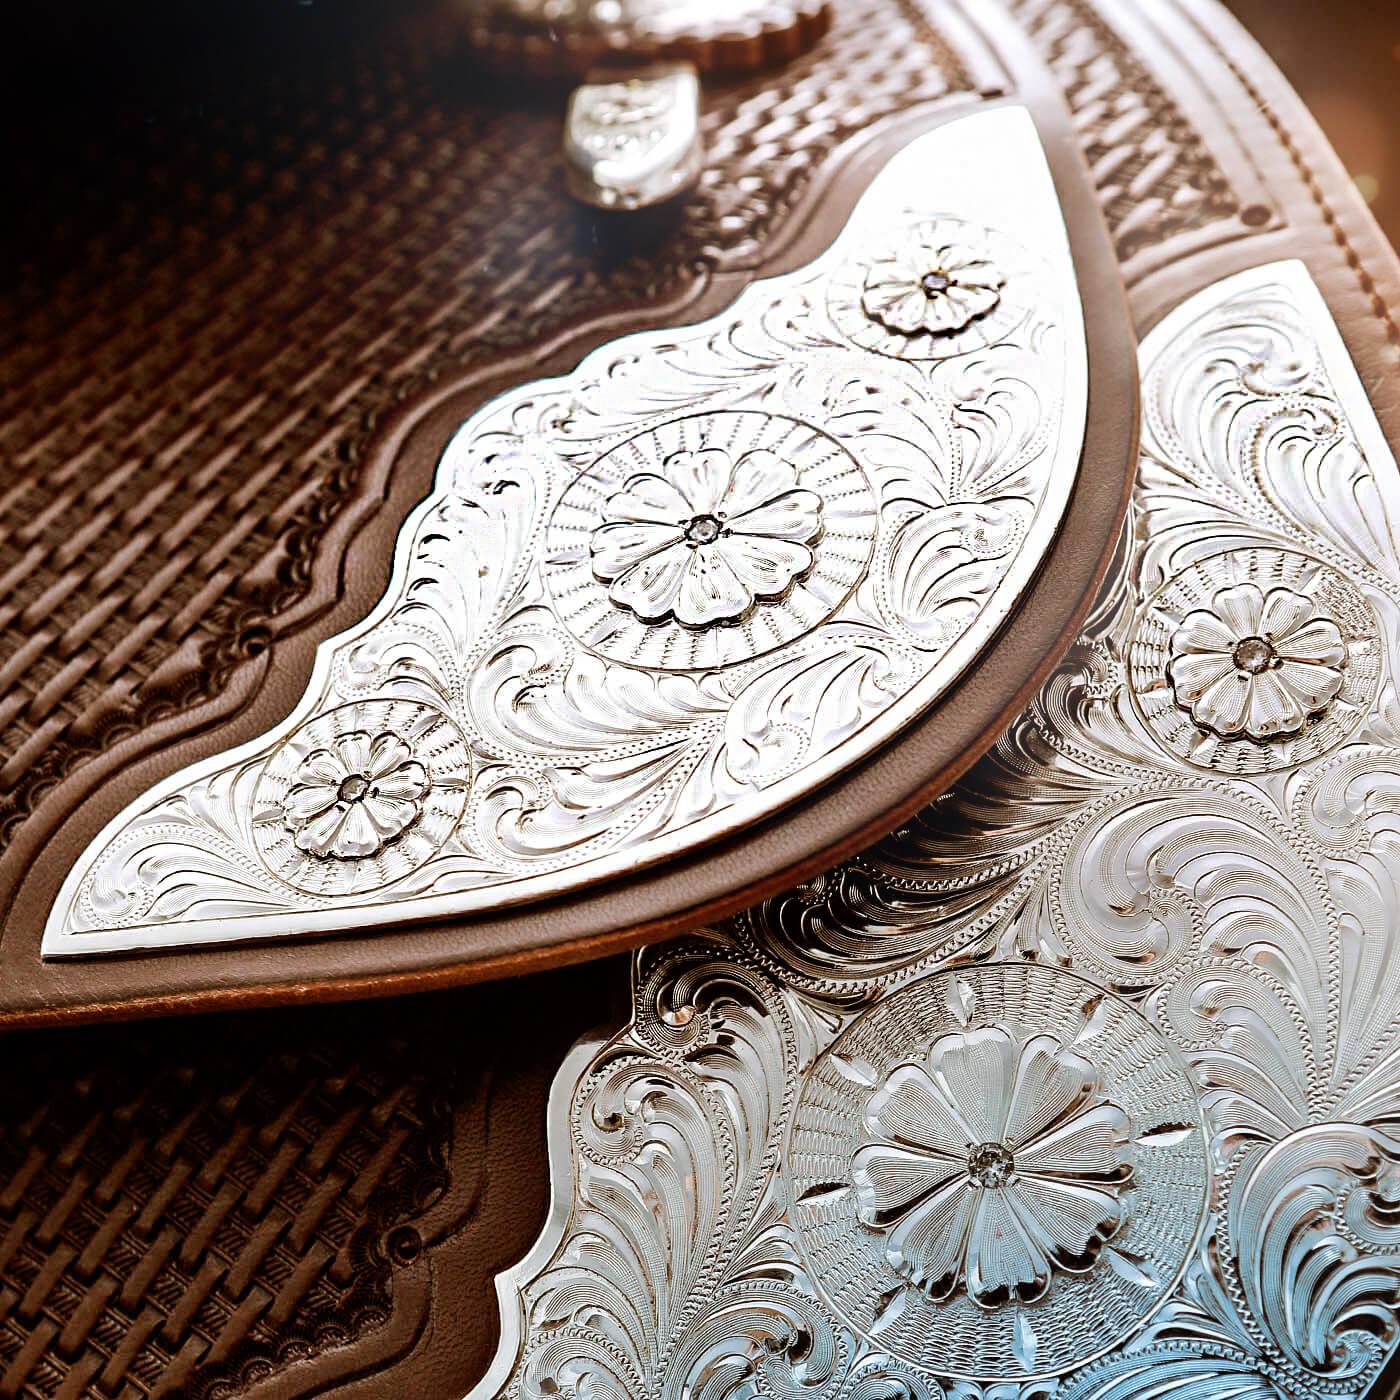 7G Sattel Materialien Silberbeschläge